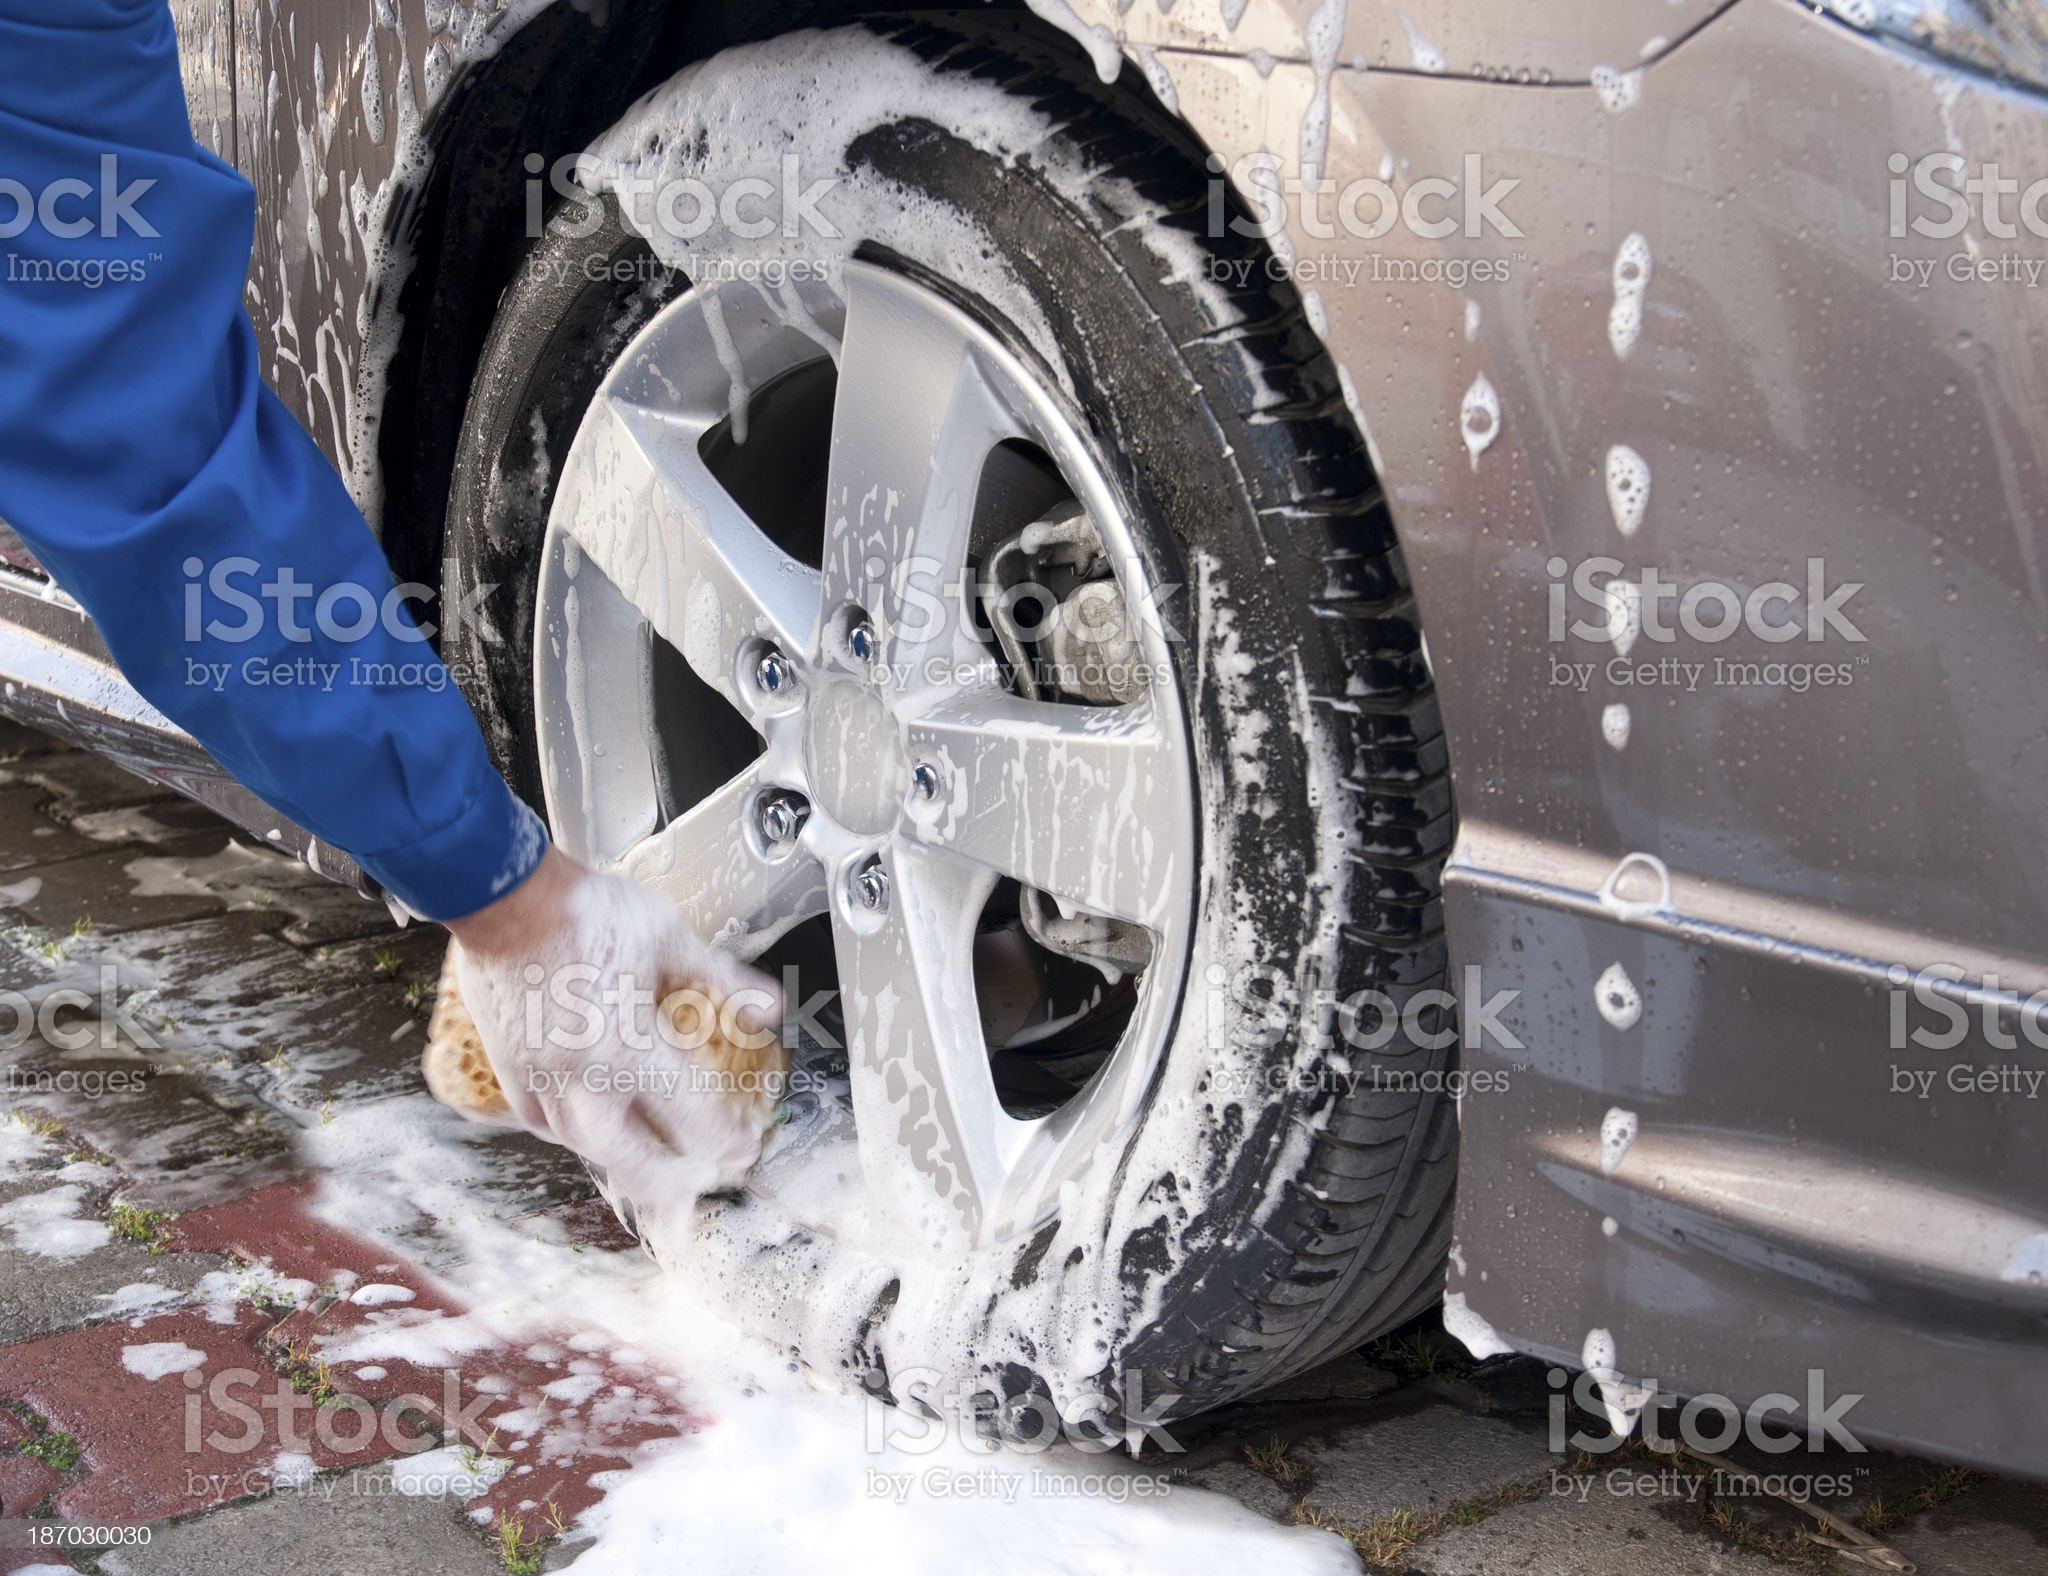 Hand Car Wash Sponge royalty-free stock photo